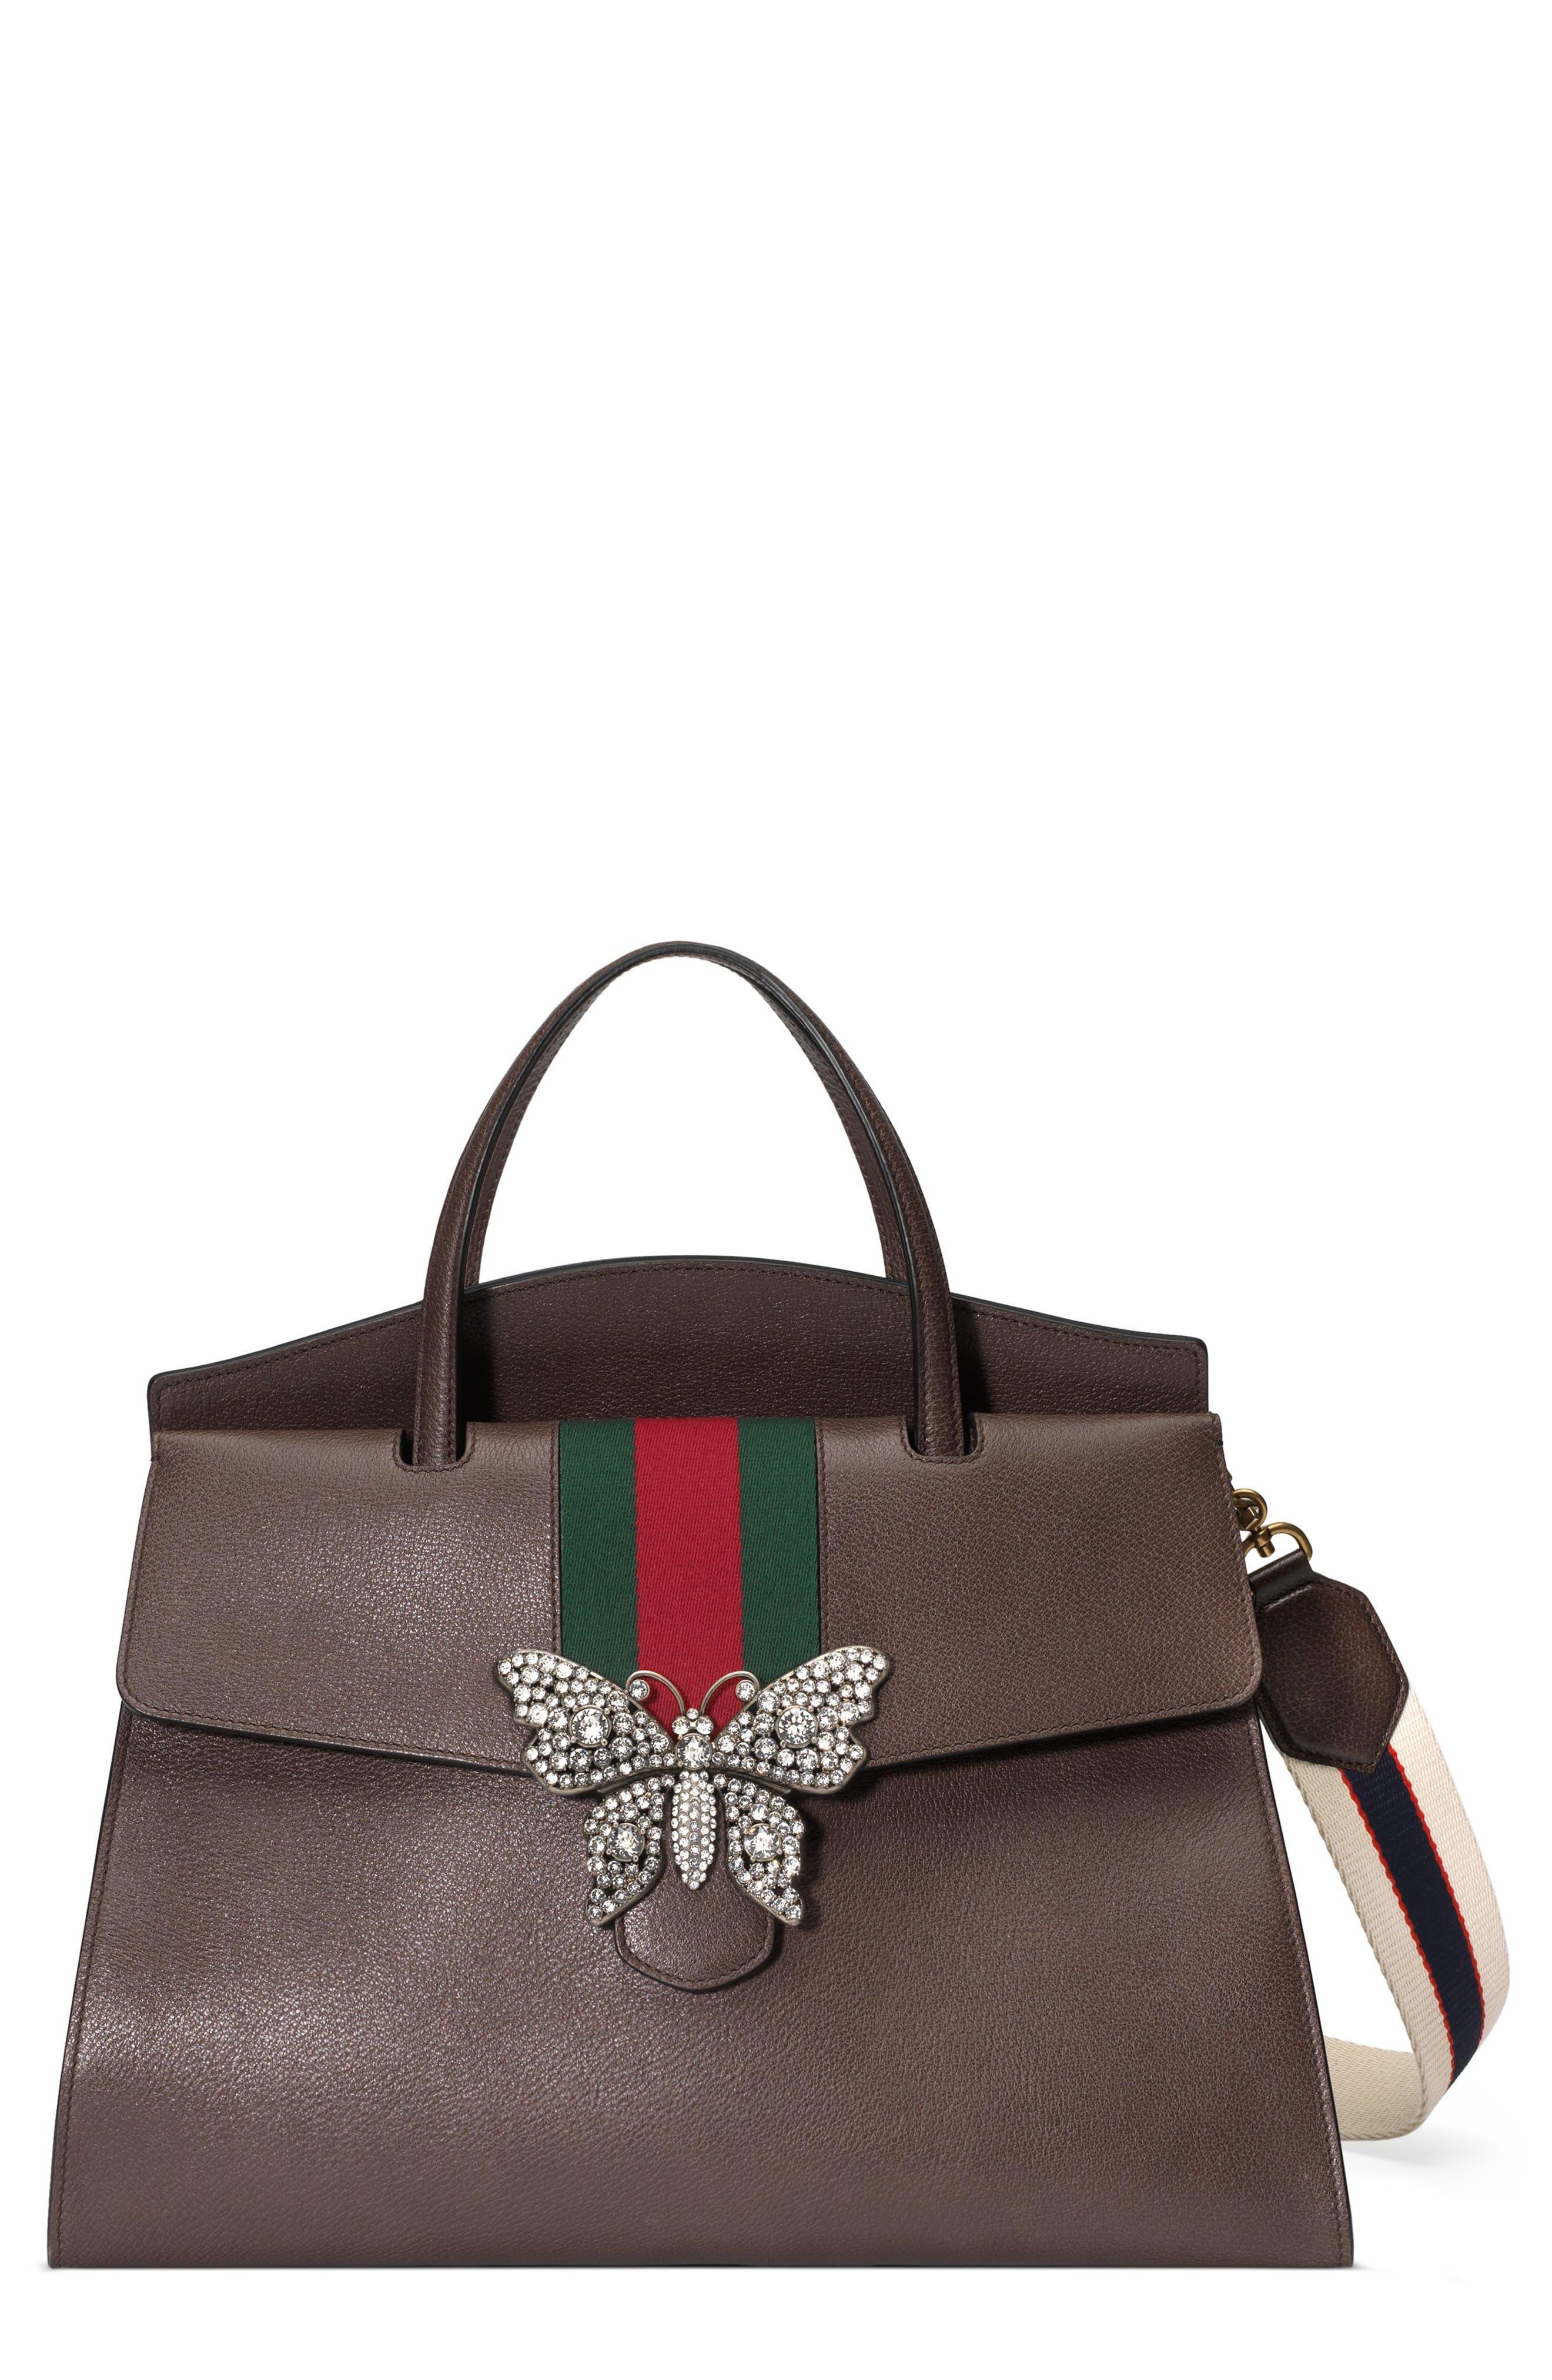 Gucci Large Linea Totem Leather Satchel